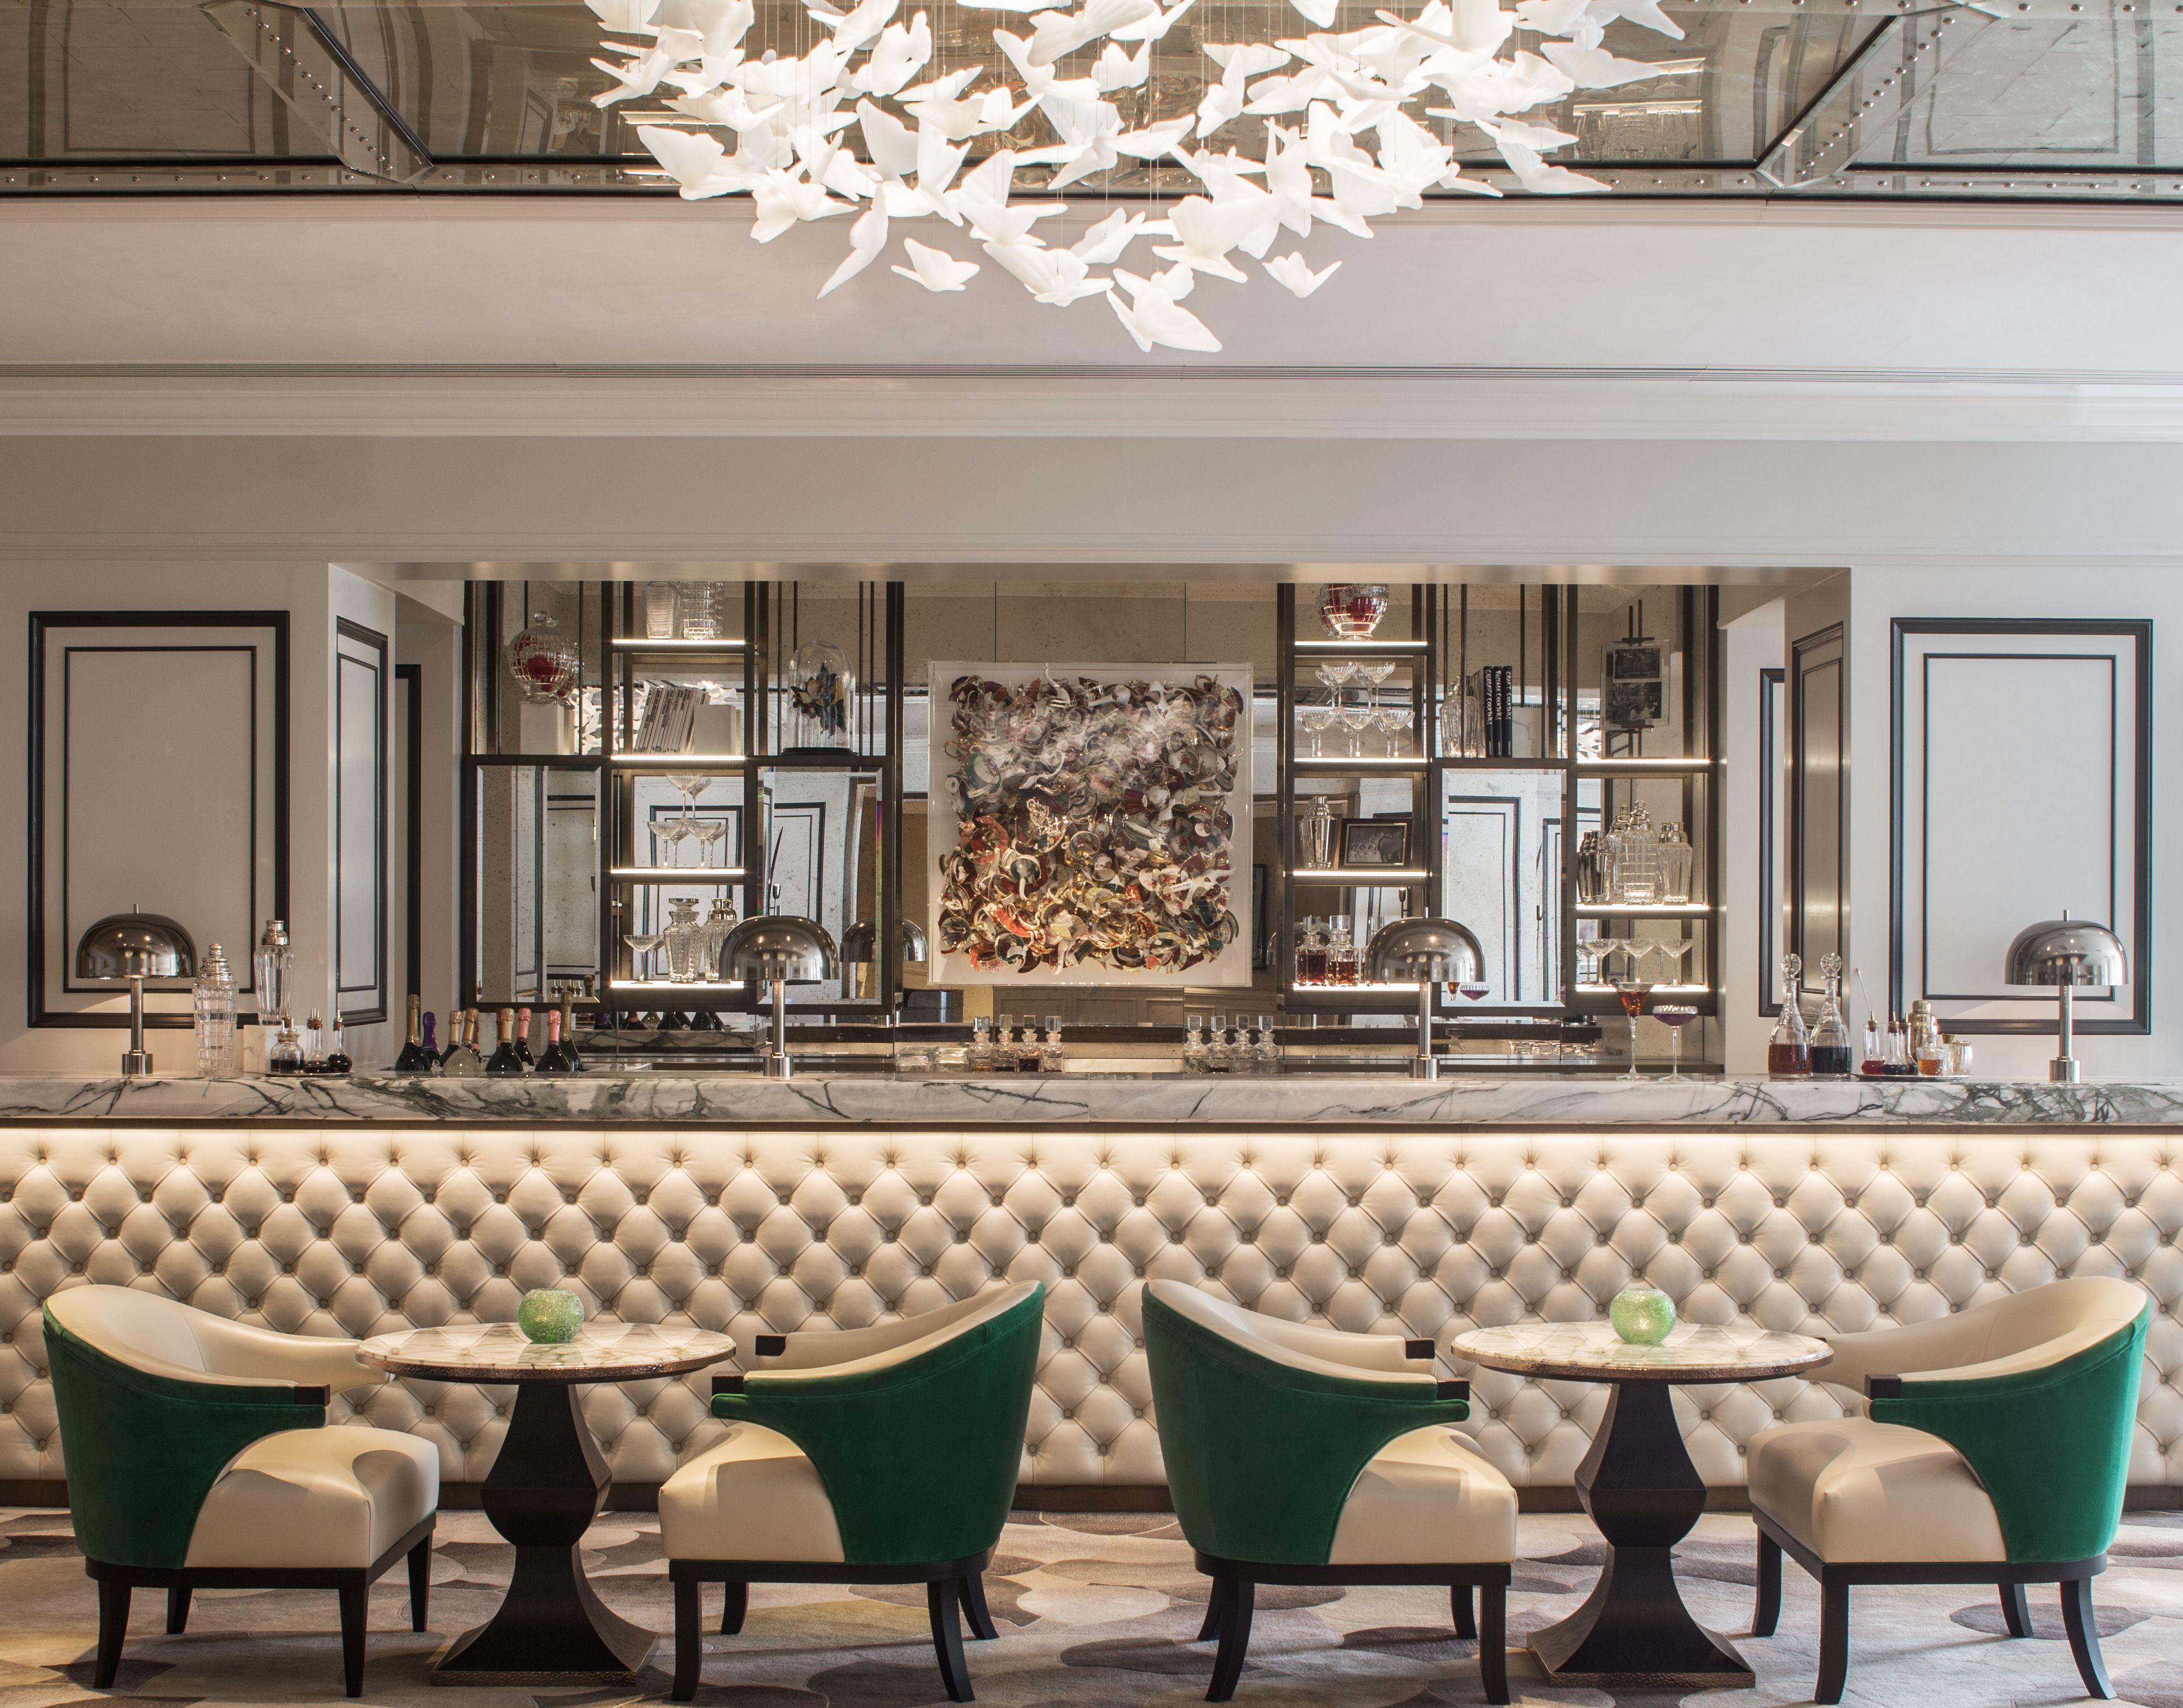 Grosvenor House By Hba Design Bar Interior Design Hotels Design Hotel Decor